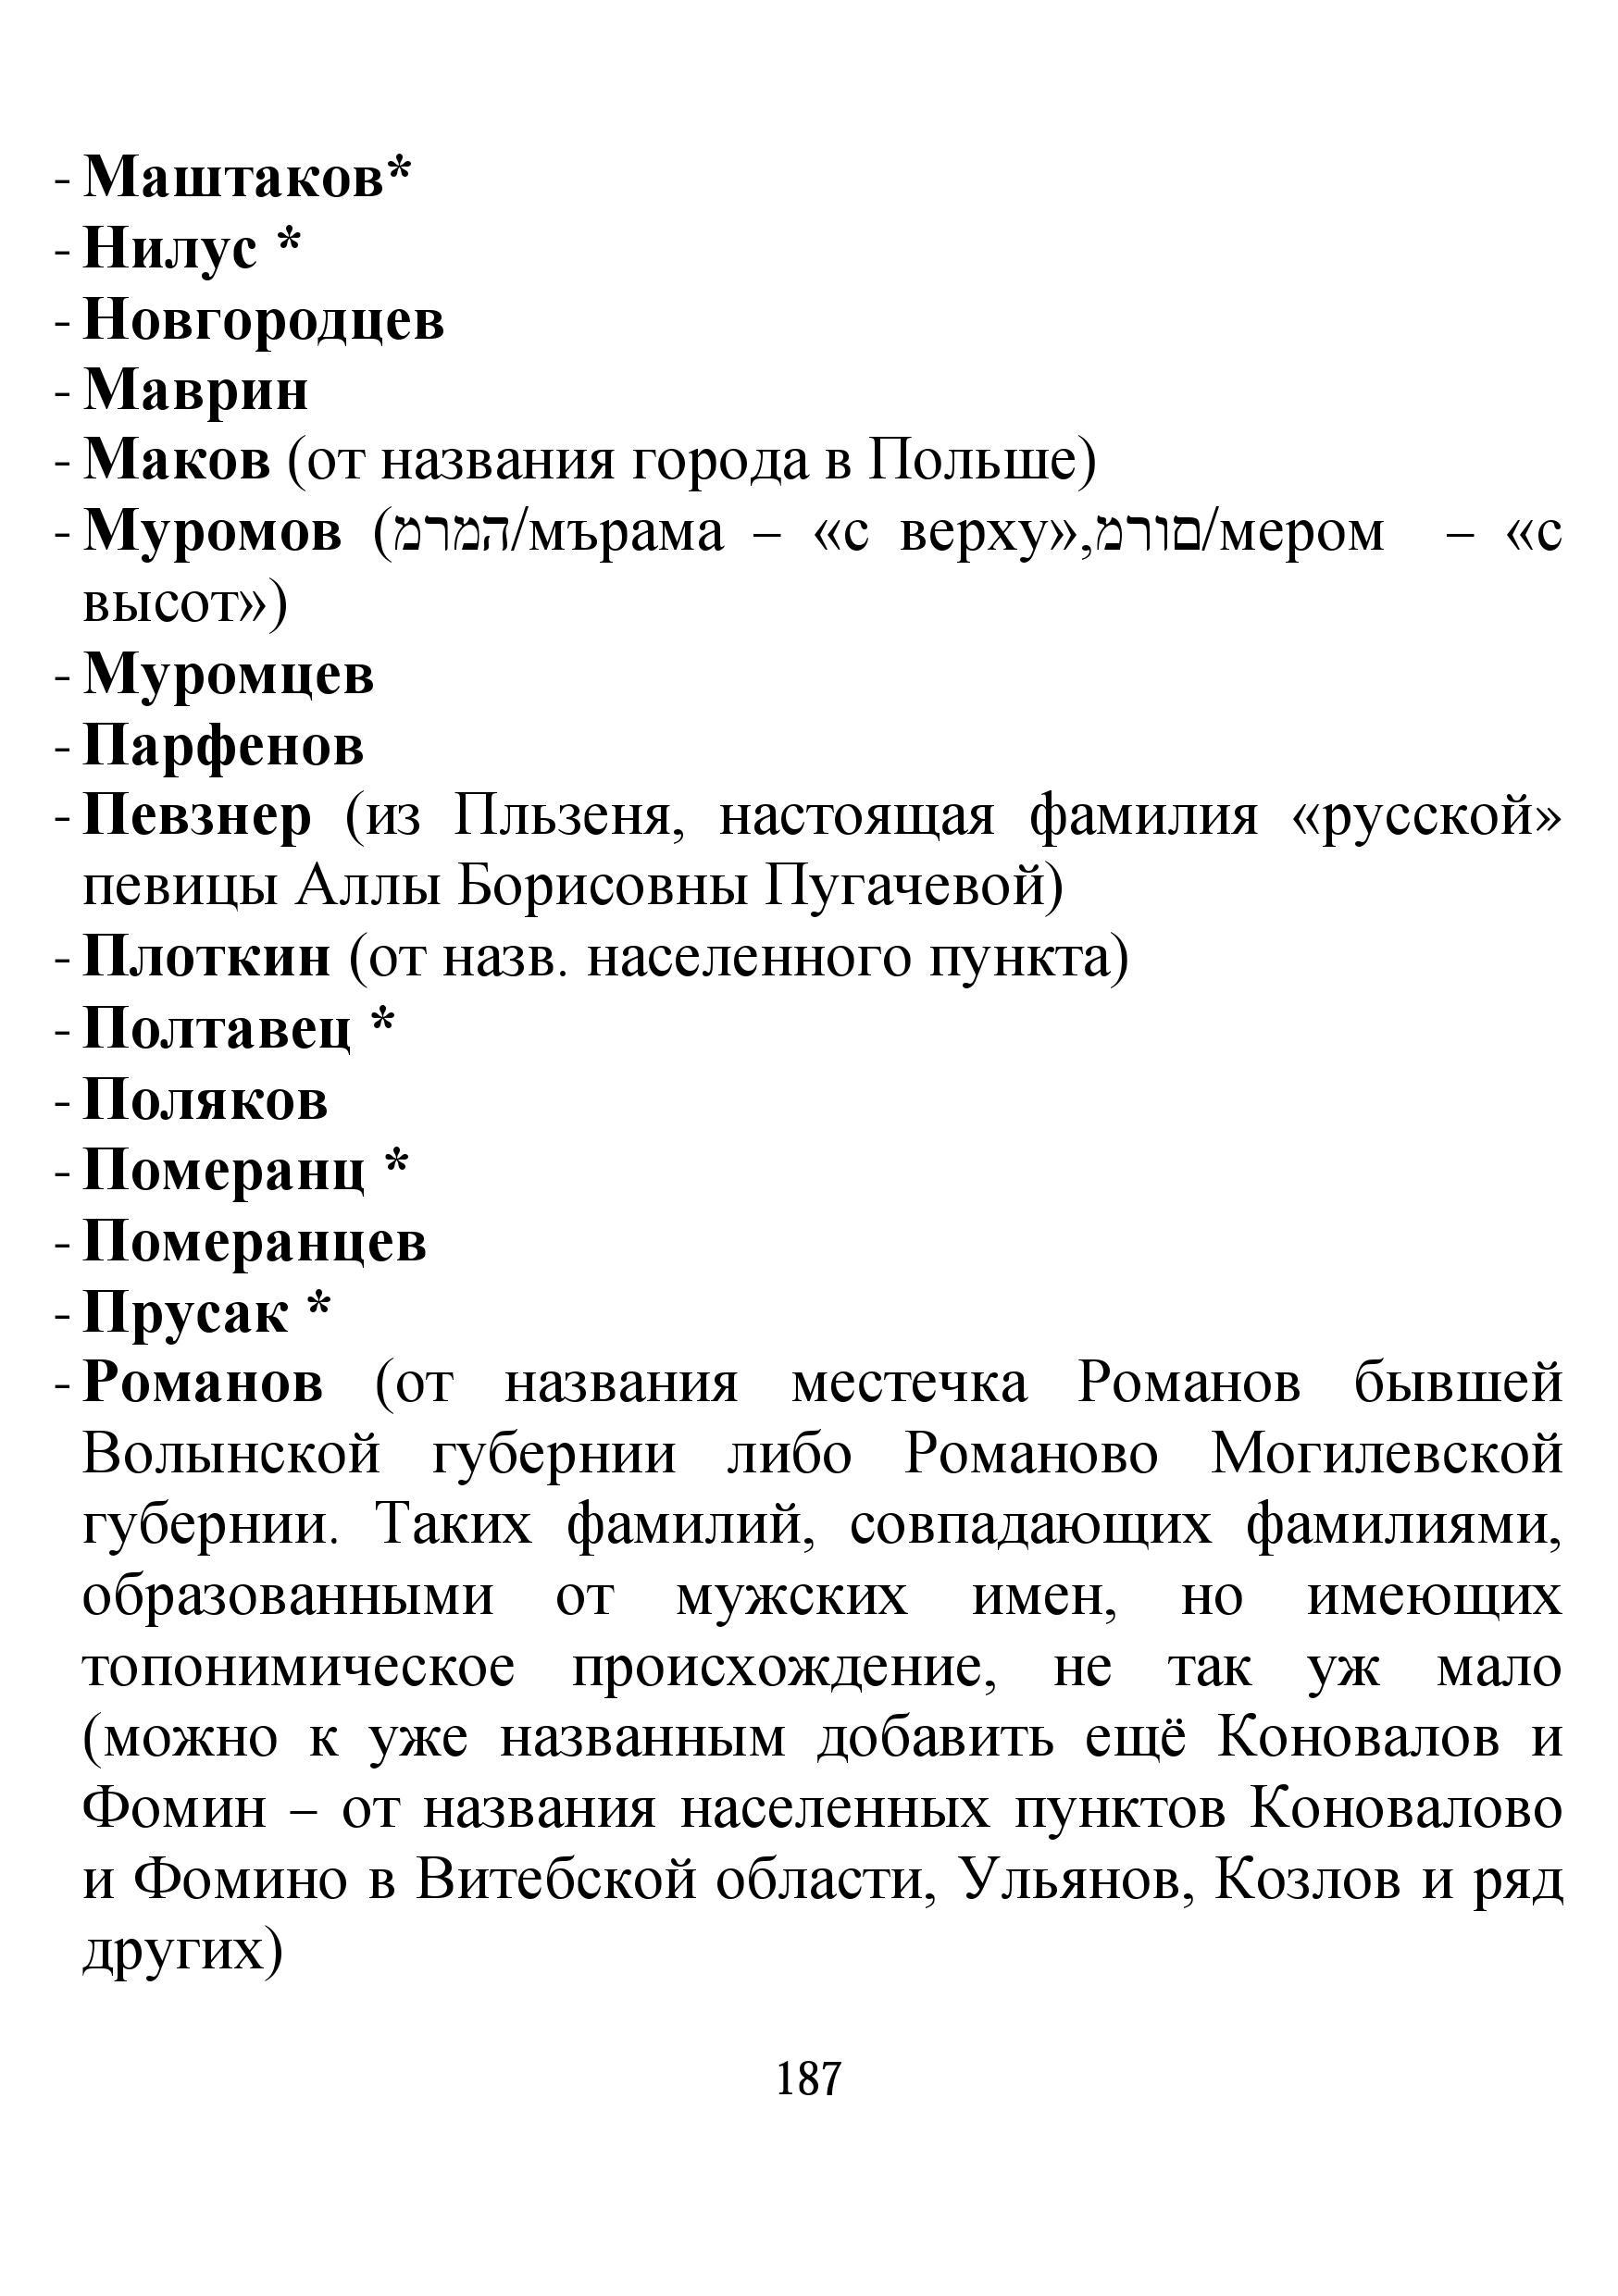 http://sf.uploads.ru/jRTX5.jpg